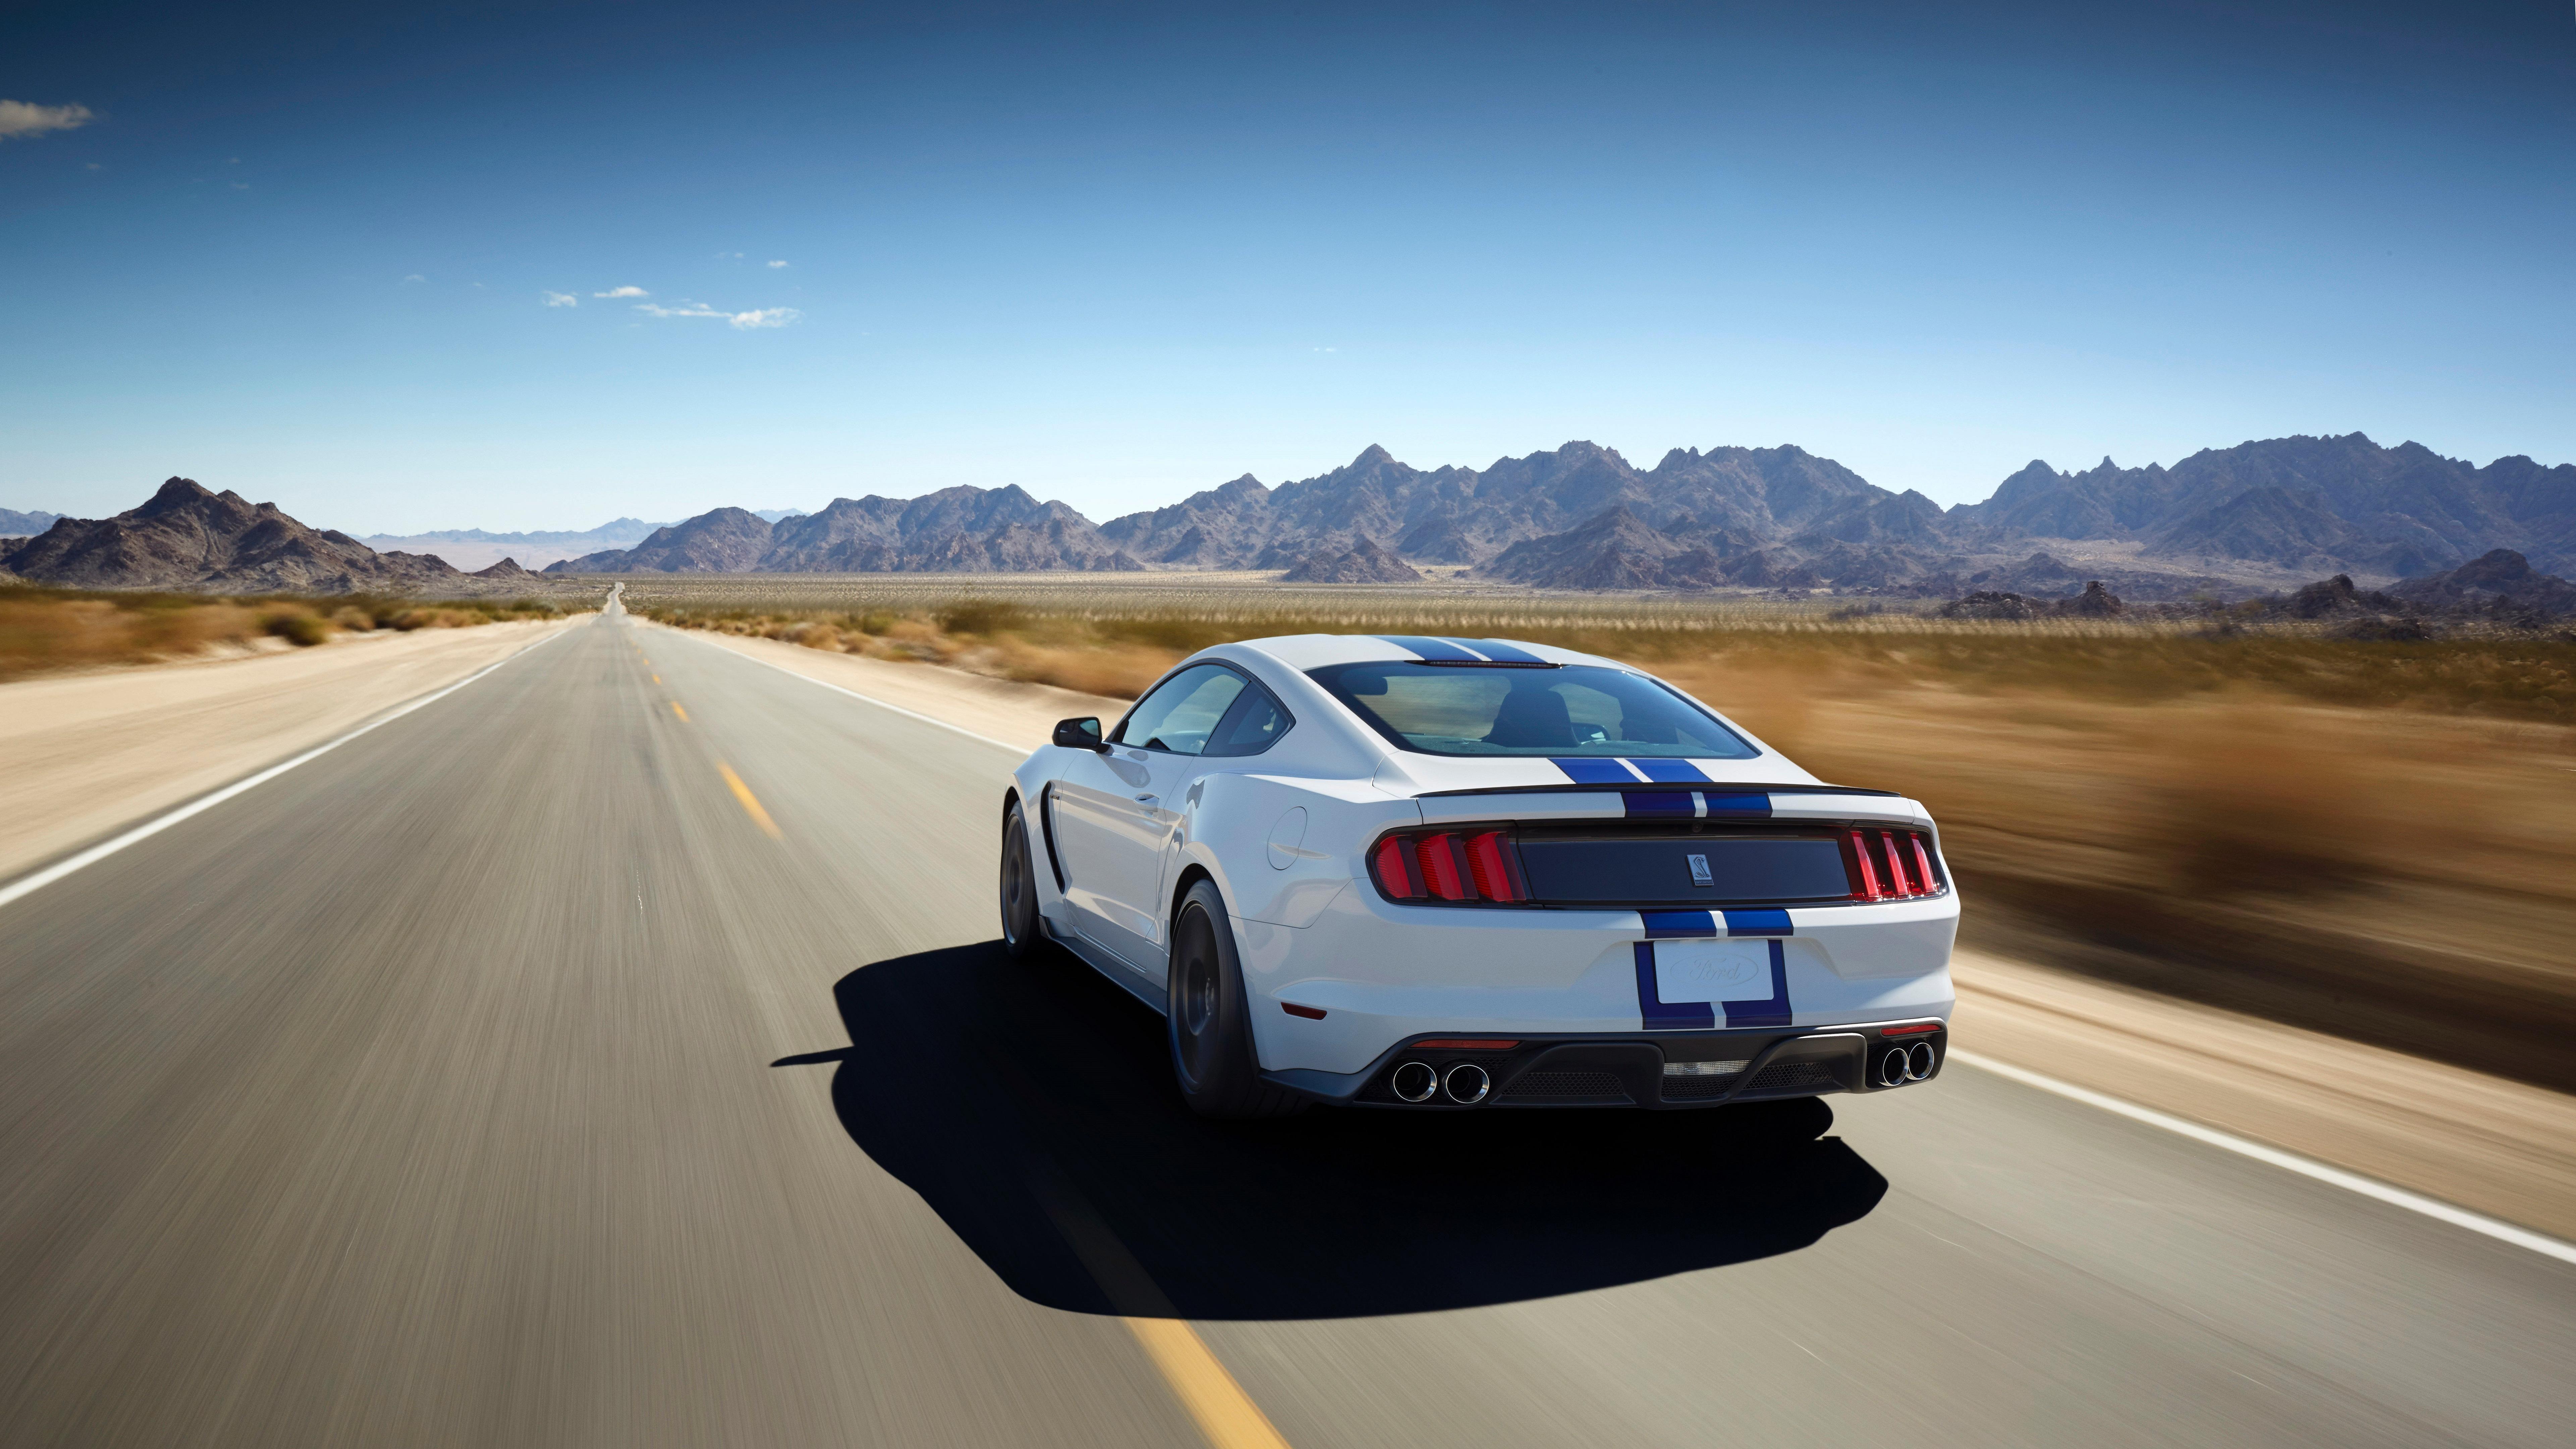 8k Car Wallpapers Top Free 8k Car Backgrounds Wallpaperaccess